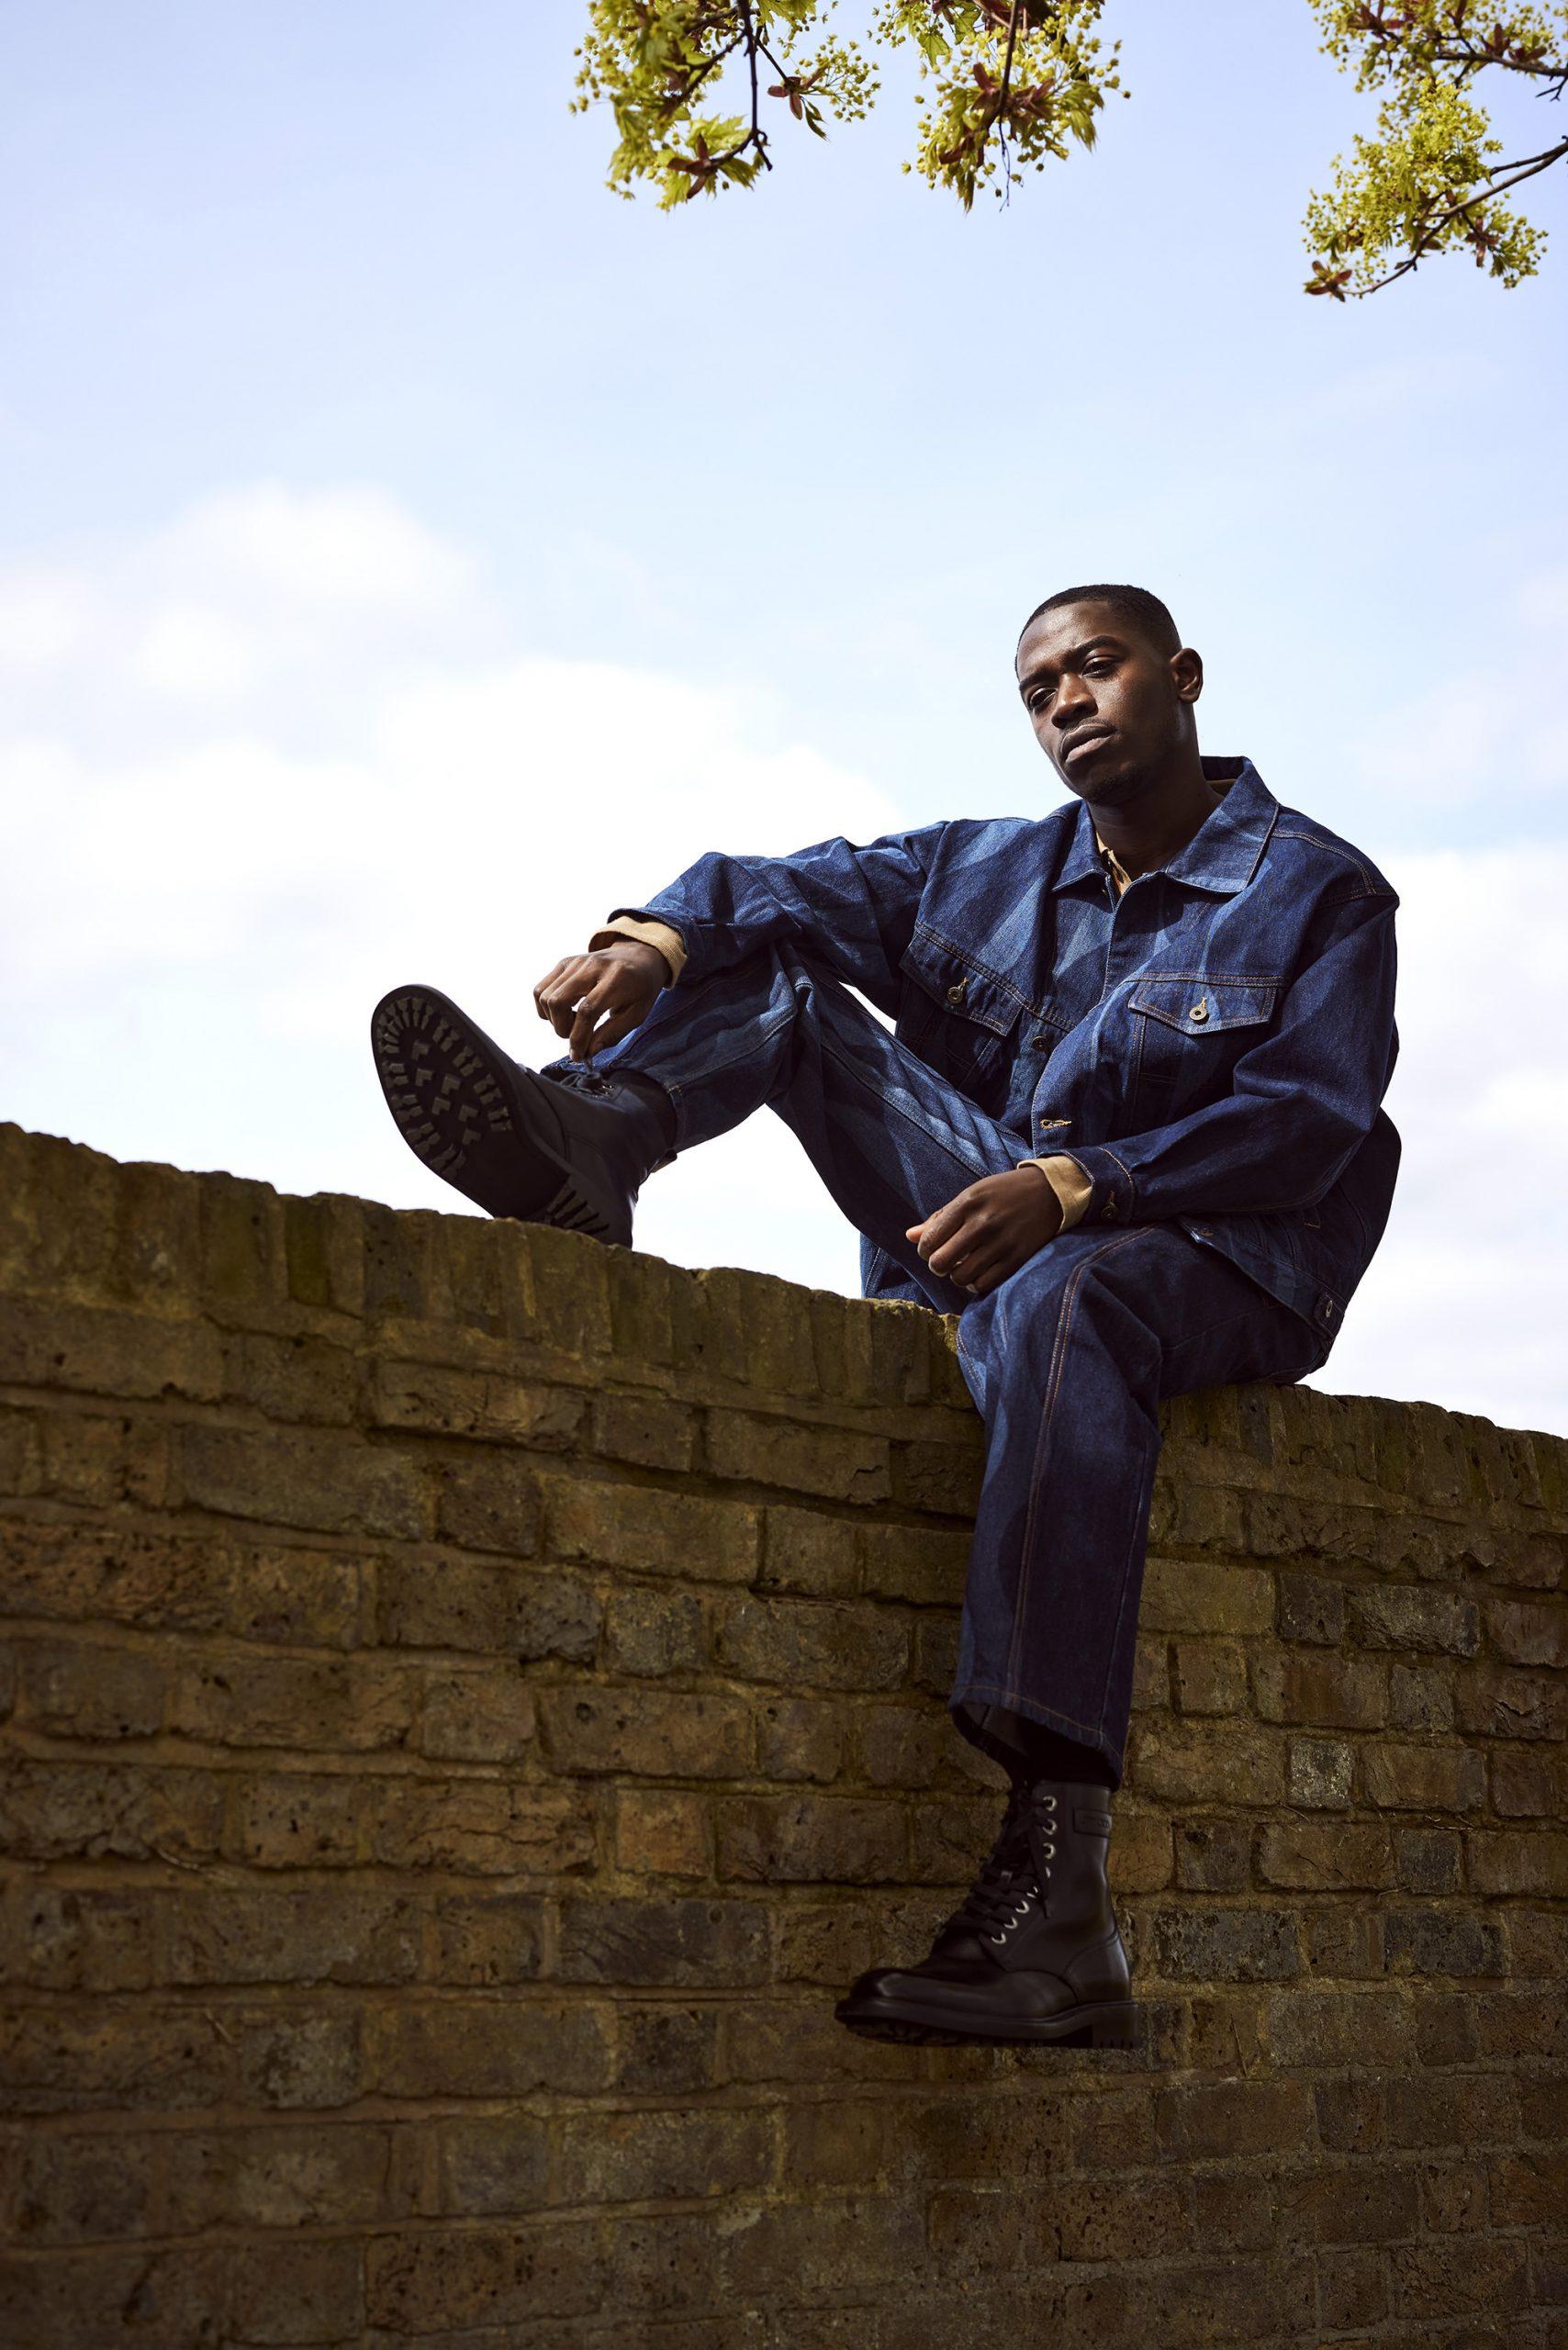 Damson Idris sat on a brick wall wearing a denim jacket and trousers